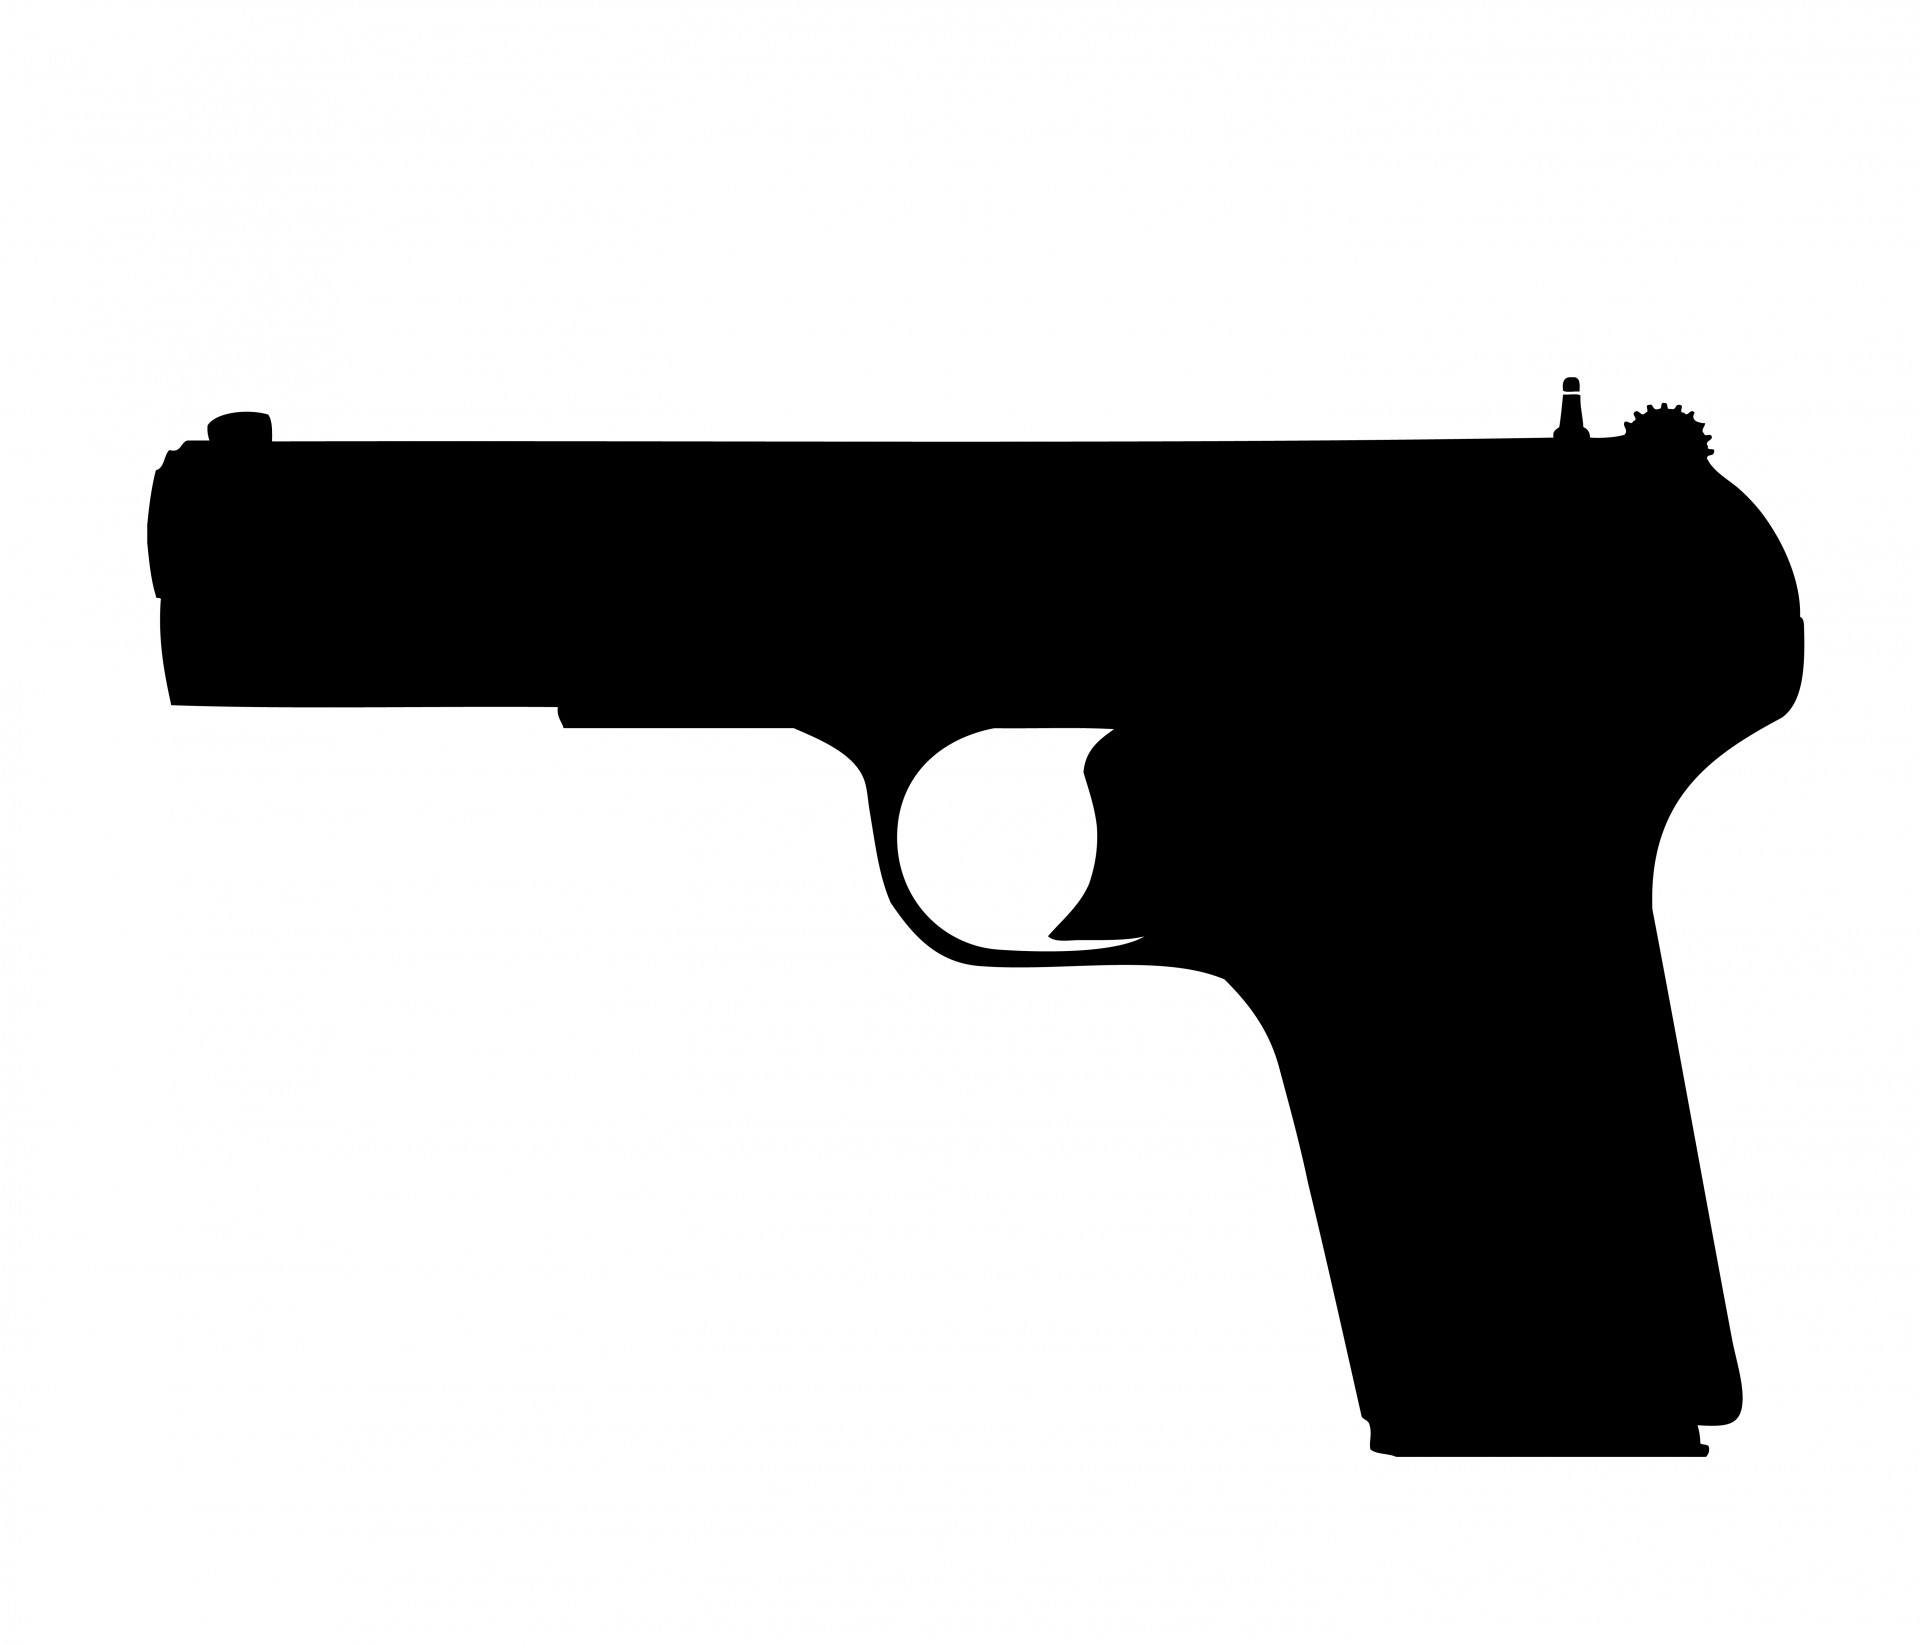 Gun, Pistol Clipart Free Stoc - Weapons Clipart